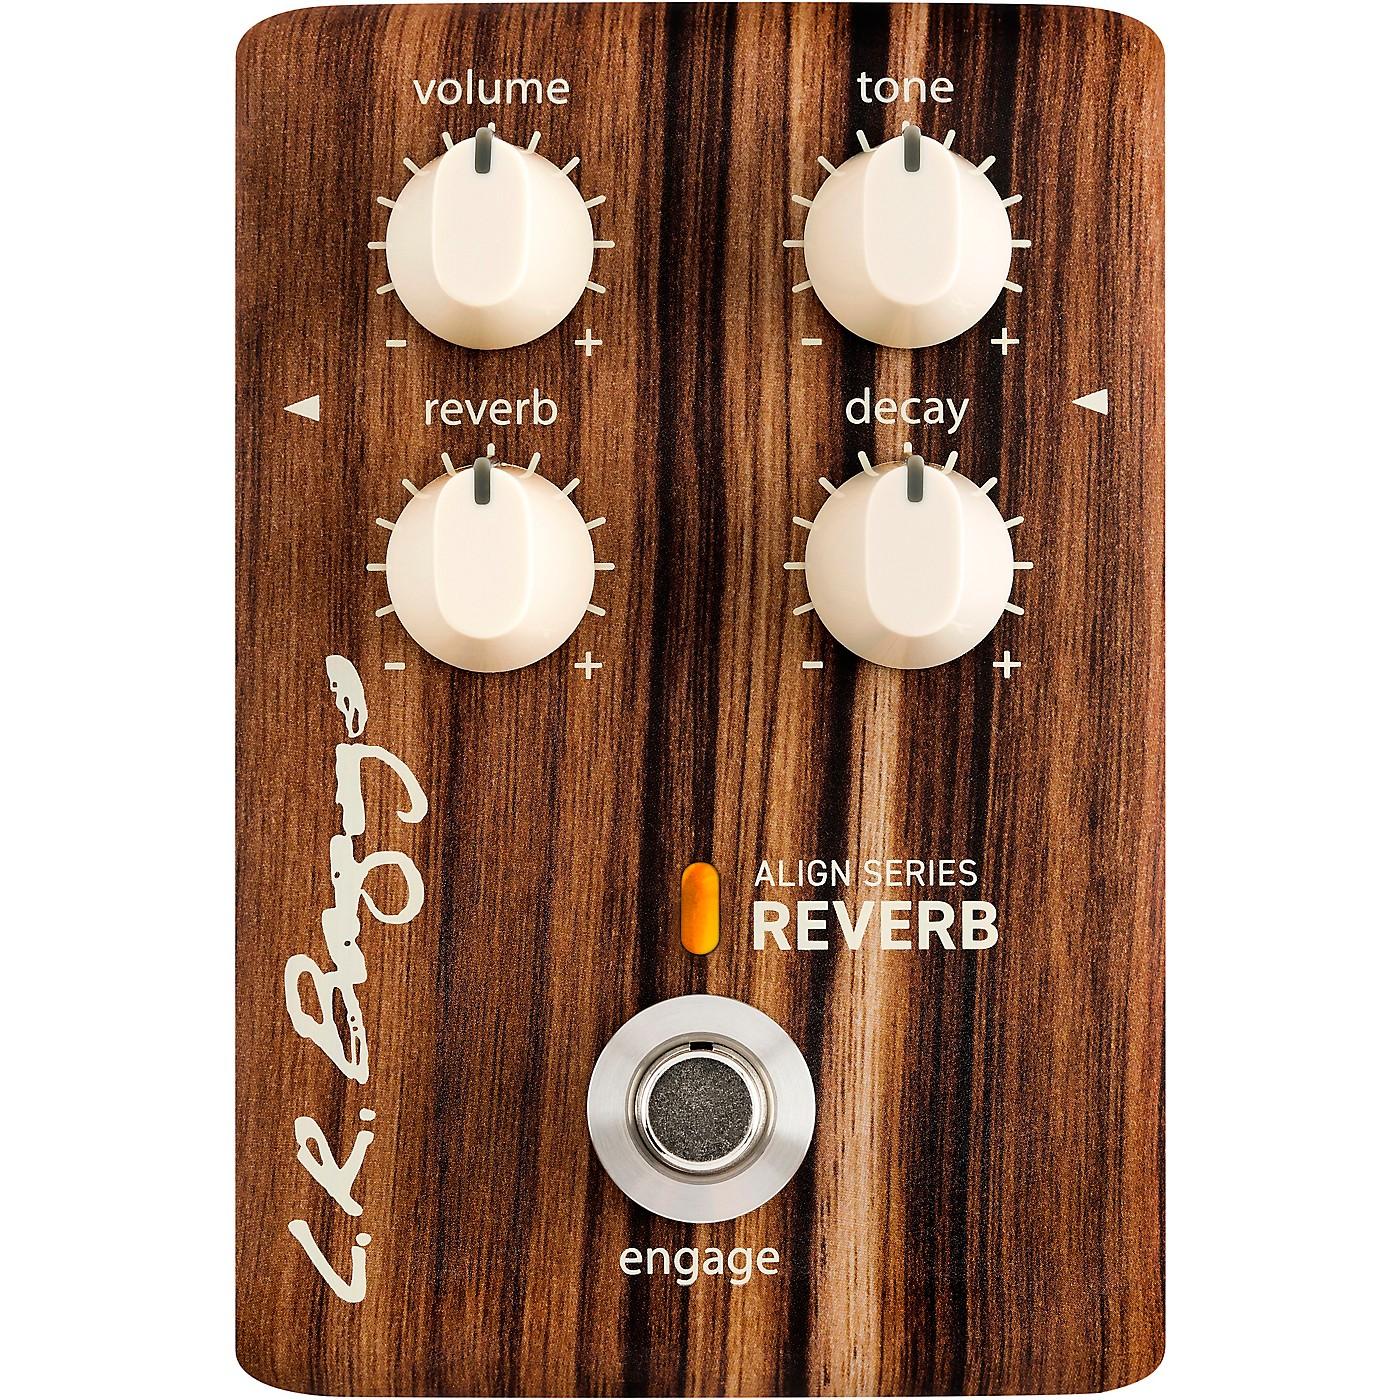 LR Baggs Align Reverb Acoustic Reverb Effects Pedal thumbnail